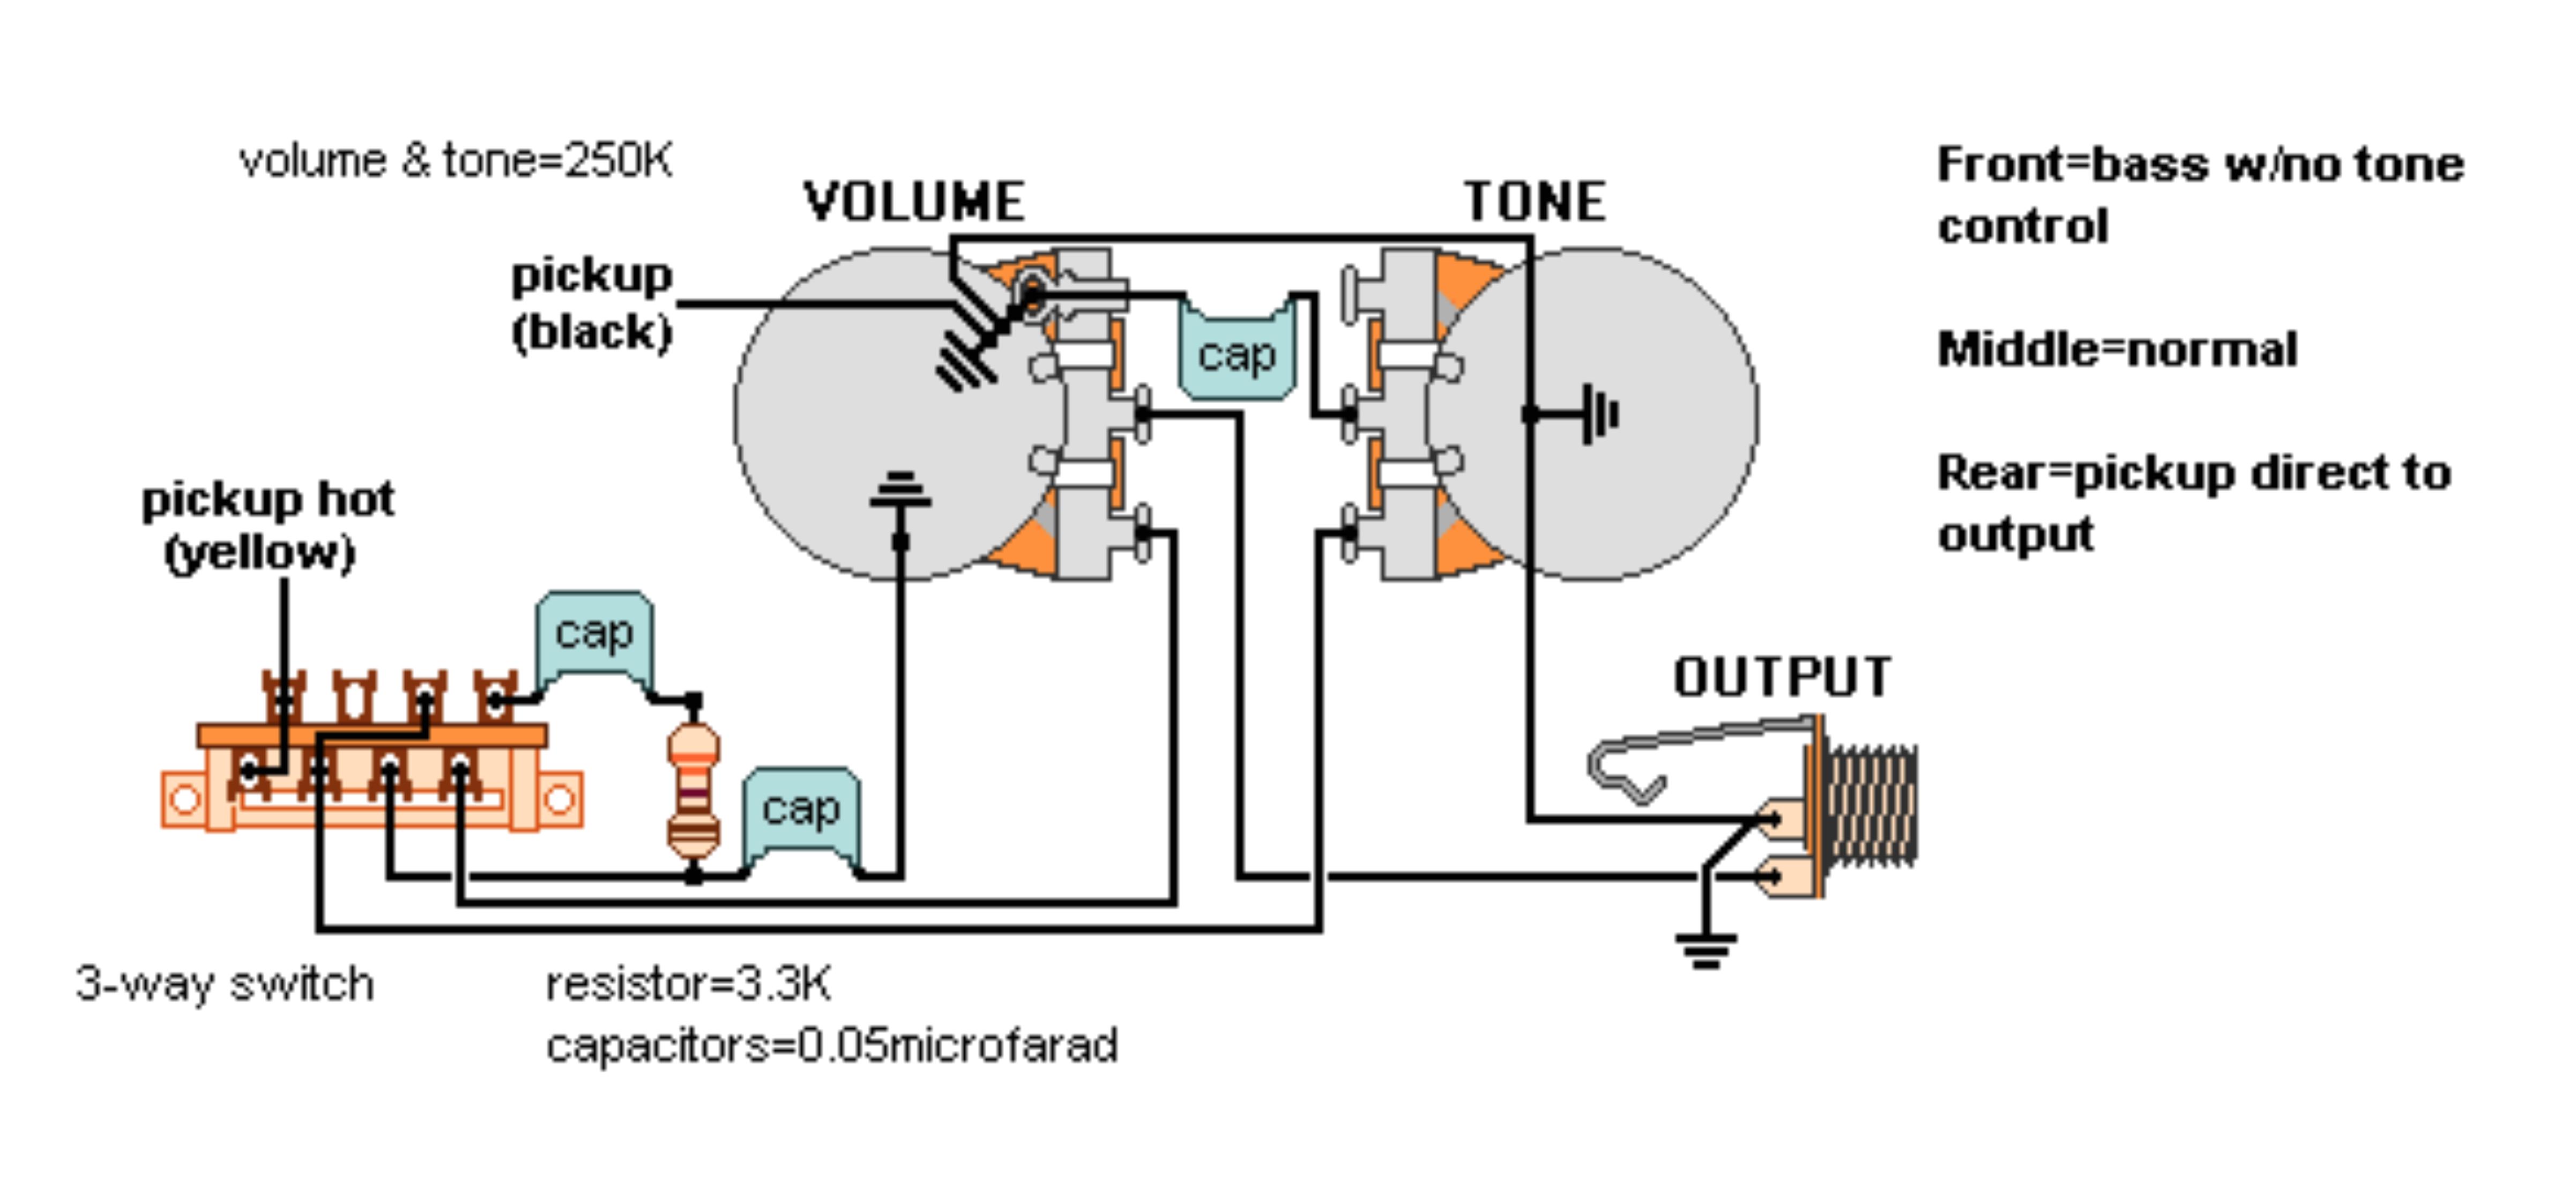 esquire 5 way wiring diagram wiring diagram img esquire 5 way wiring diagram